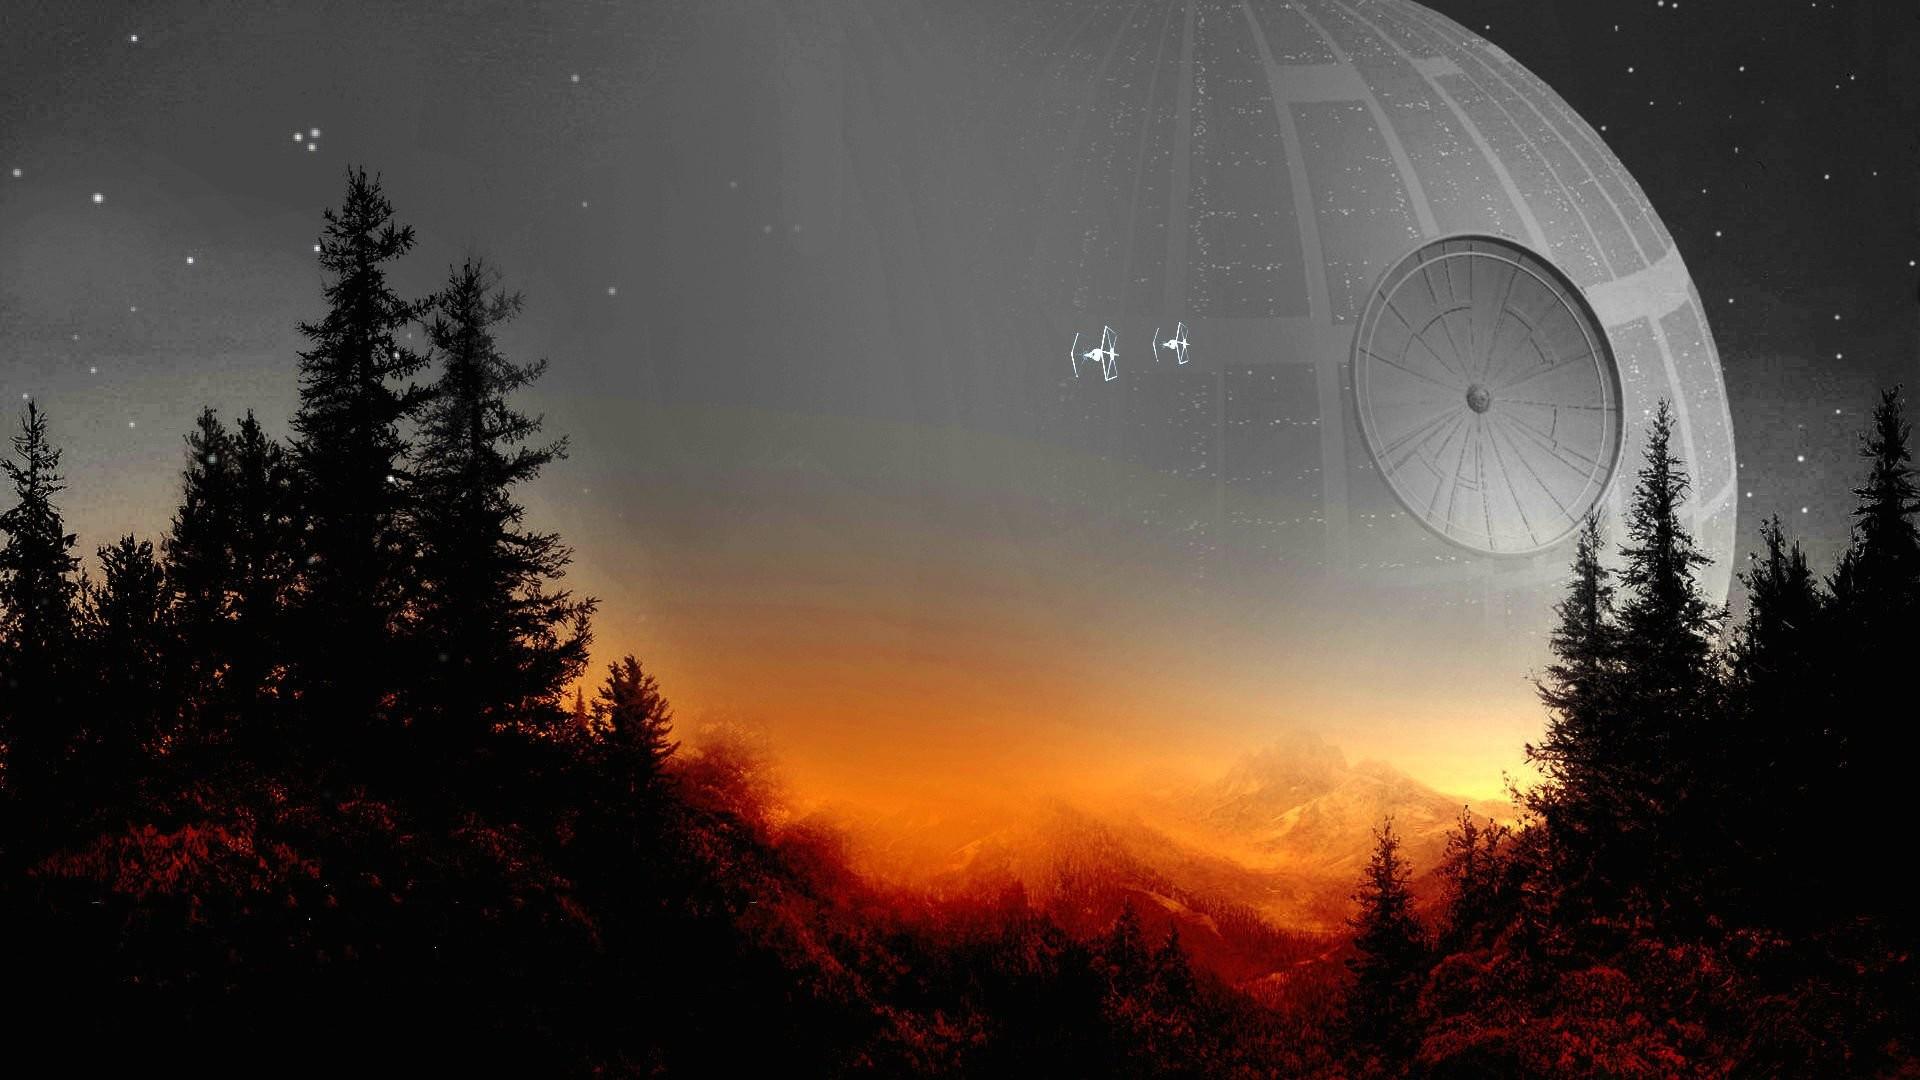 Star Wars Walpaper Posted By Michelle Peltier